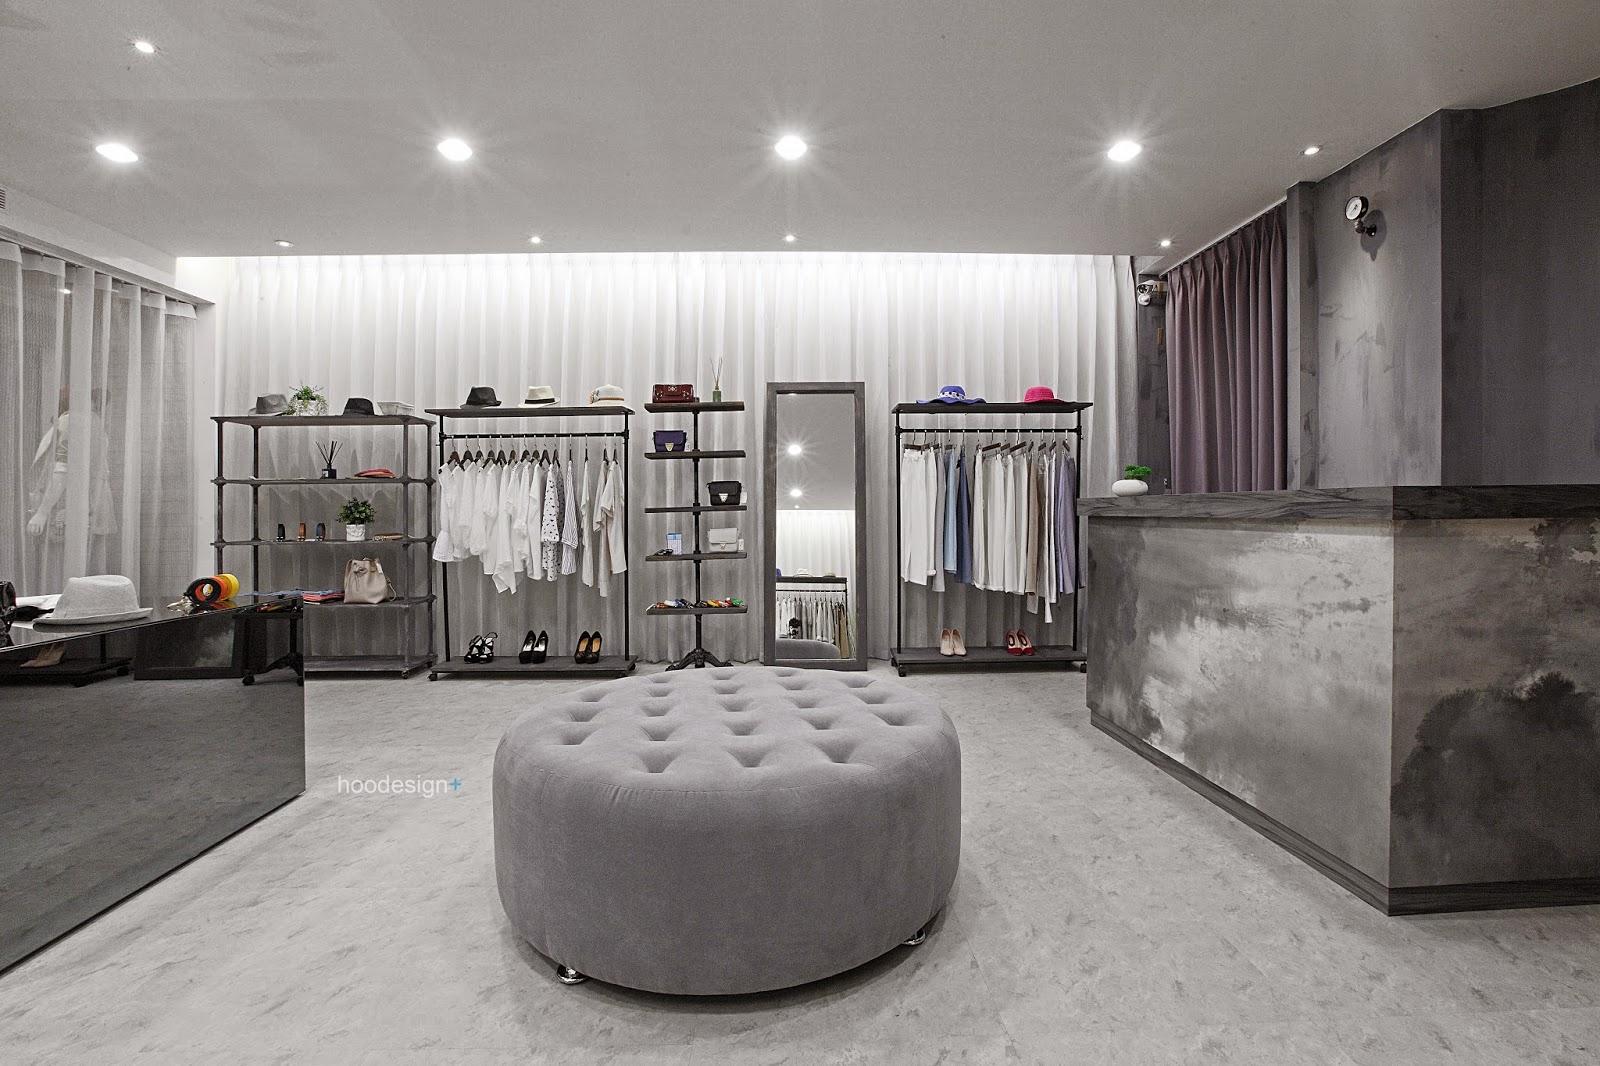 hoodesign+: MOUN墨服飾店 - 高雄服飾店設計